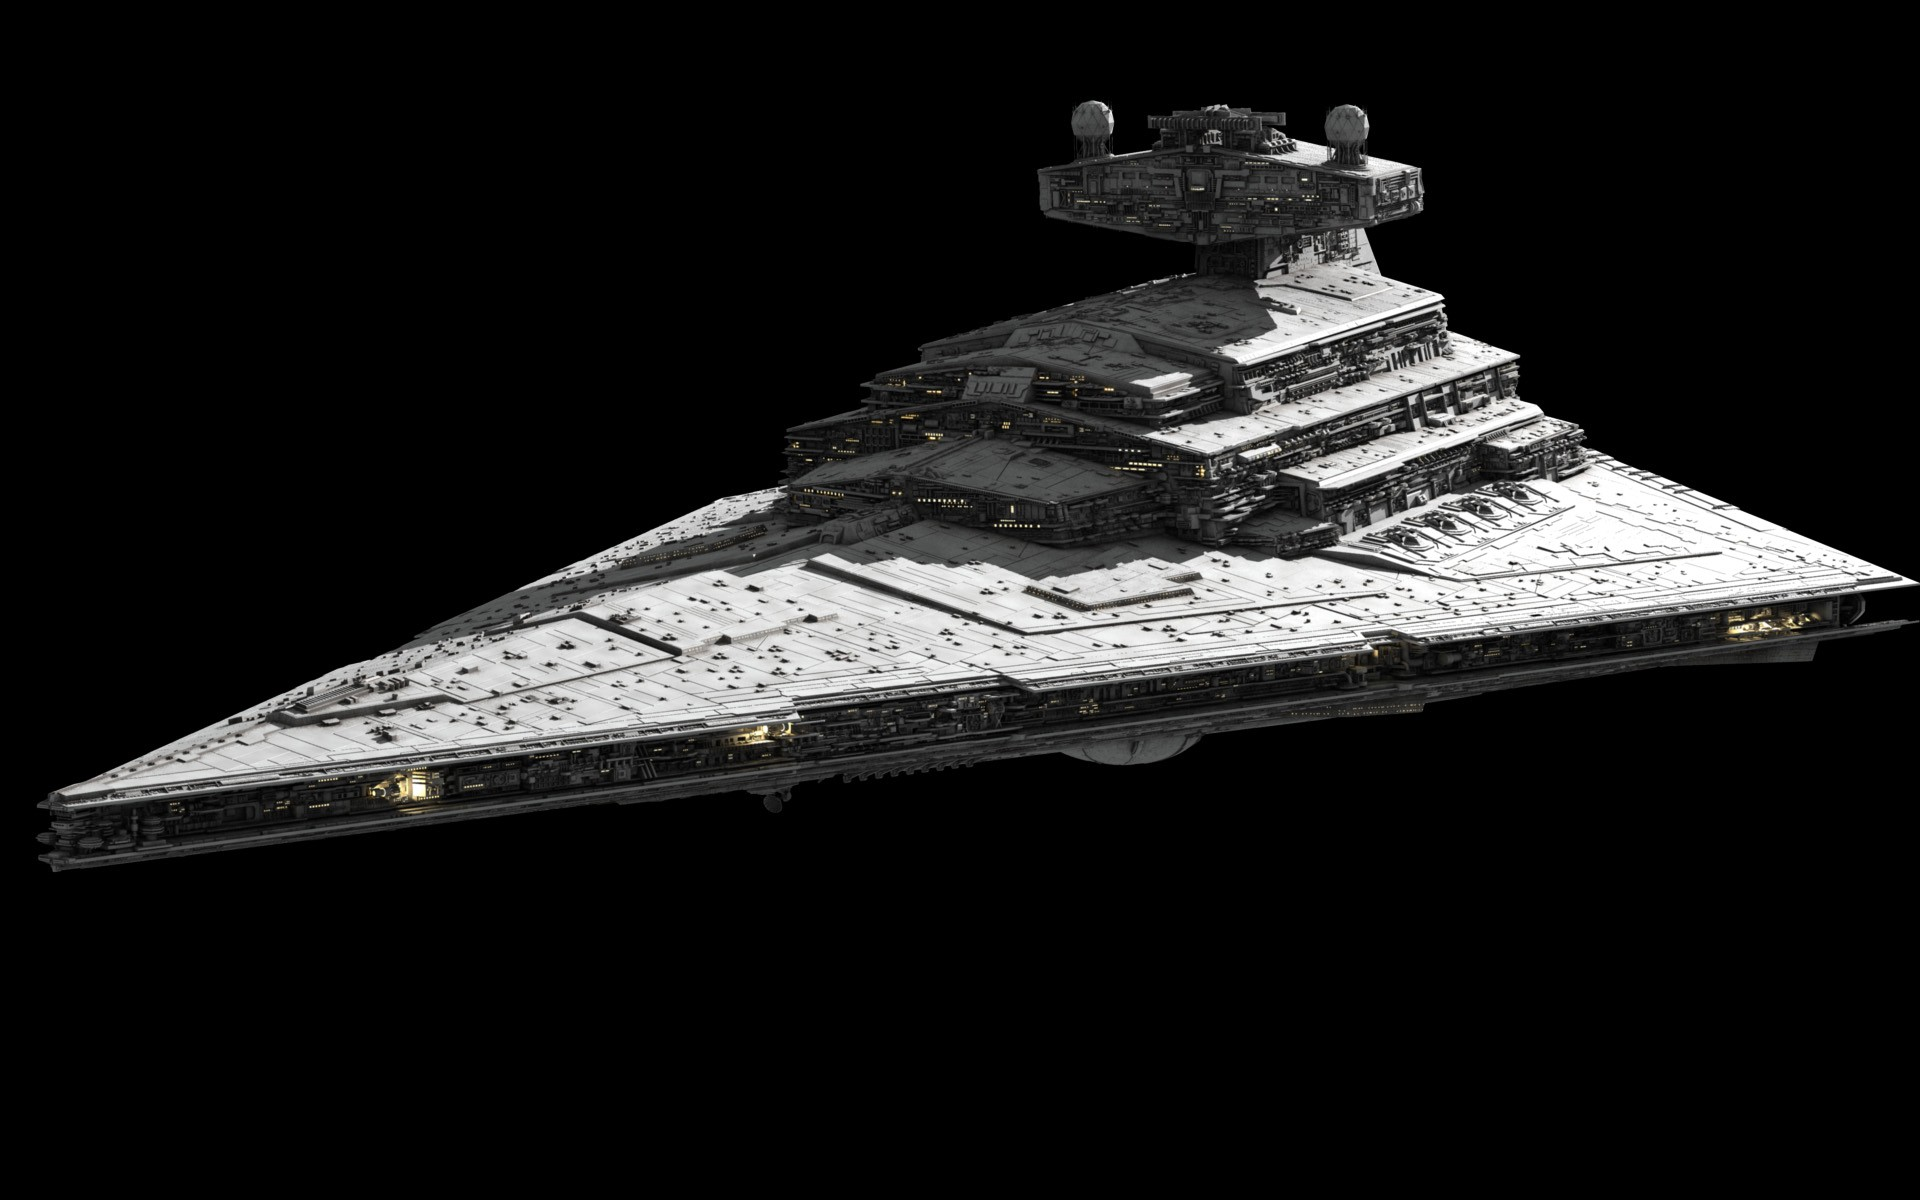 General 1920x1200 Star Wars spaceship Star Destroyer Imperial Forces render Star Wars Ships fractalsponge